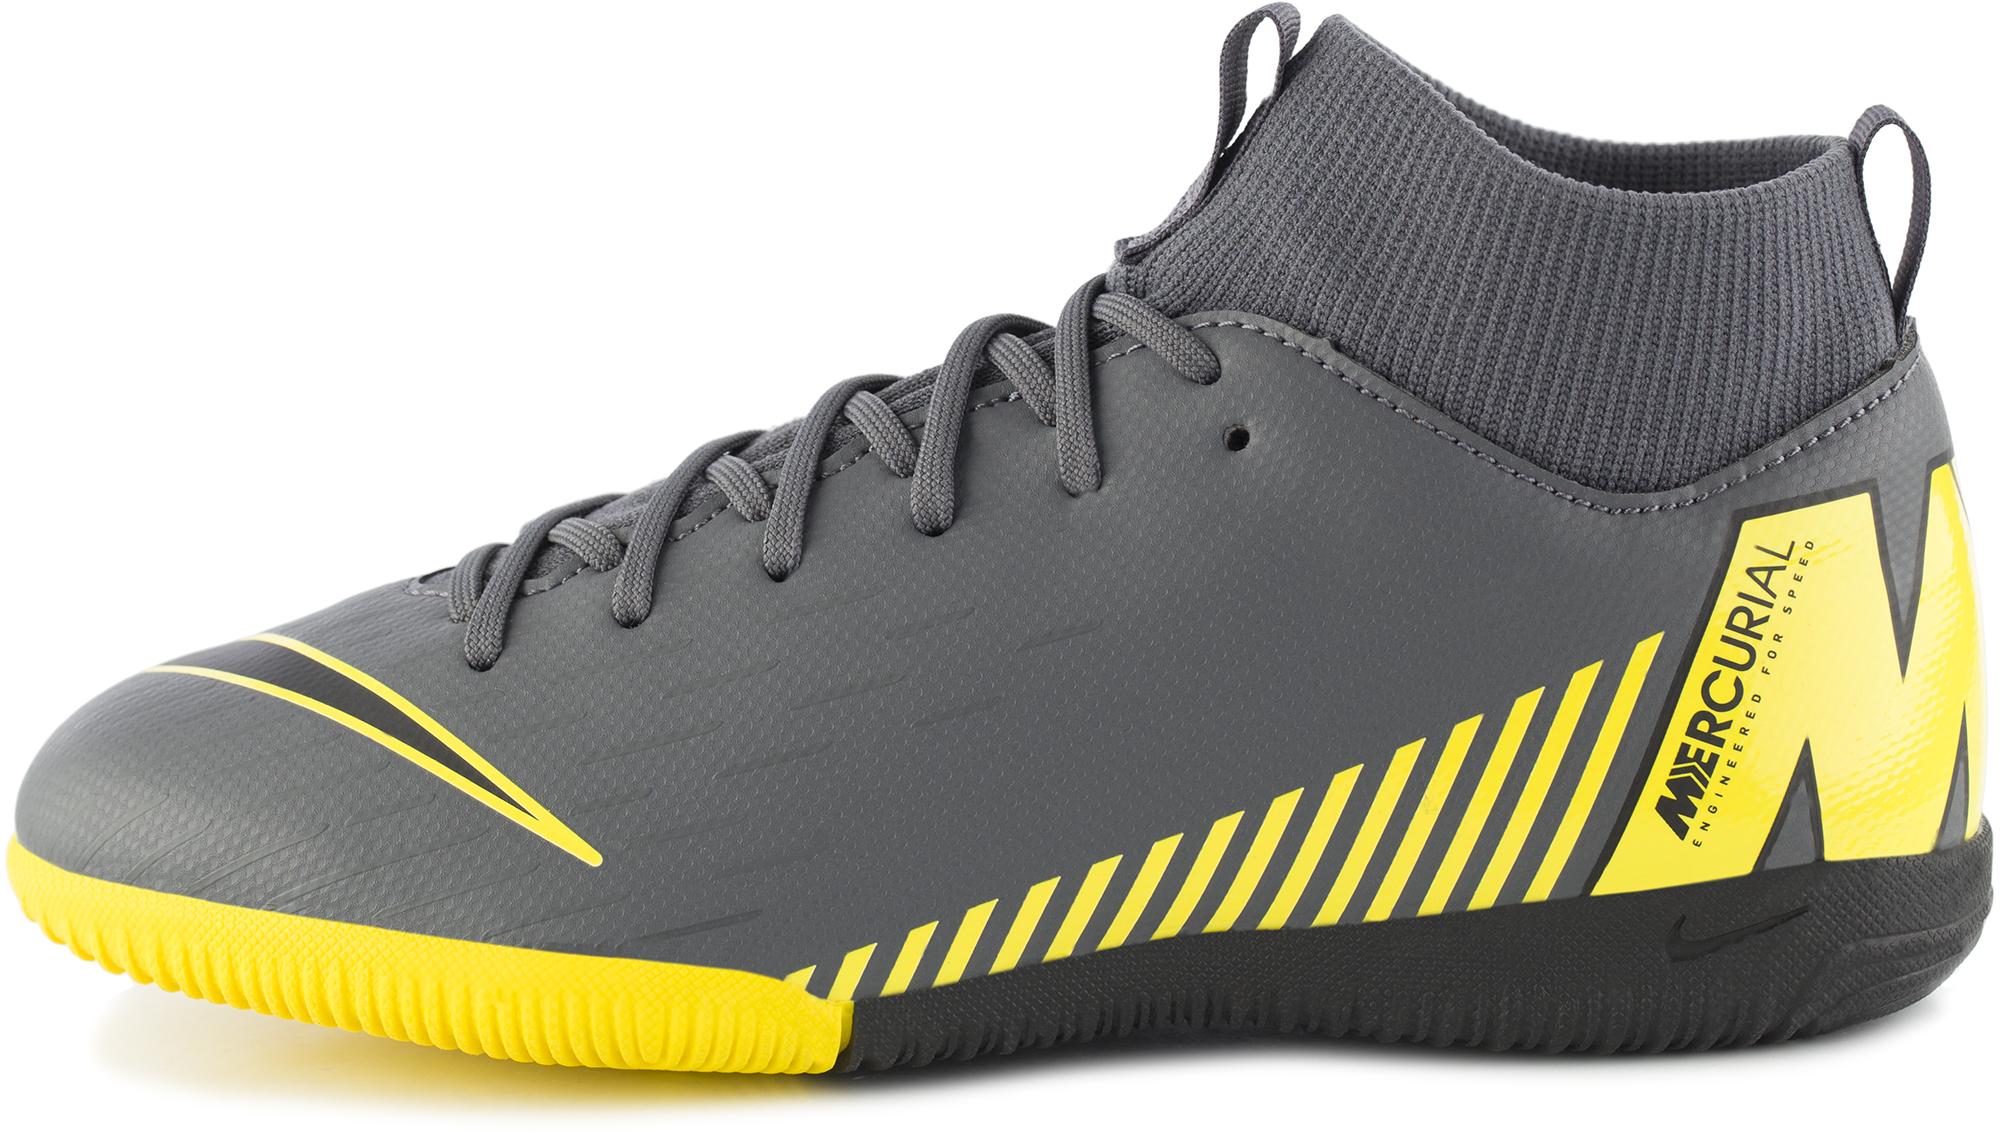 Nike Бутсы для мальчиков Nike Mercurial Superfly 6 Academy GS IC, размер 37,5 цена